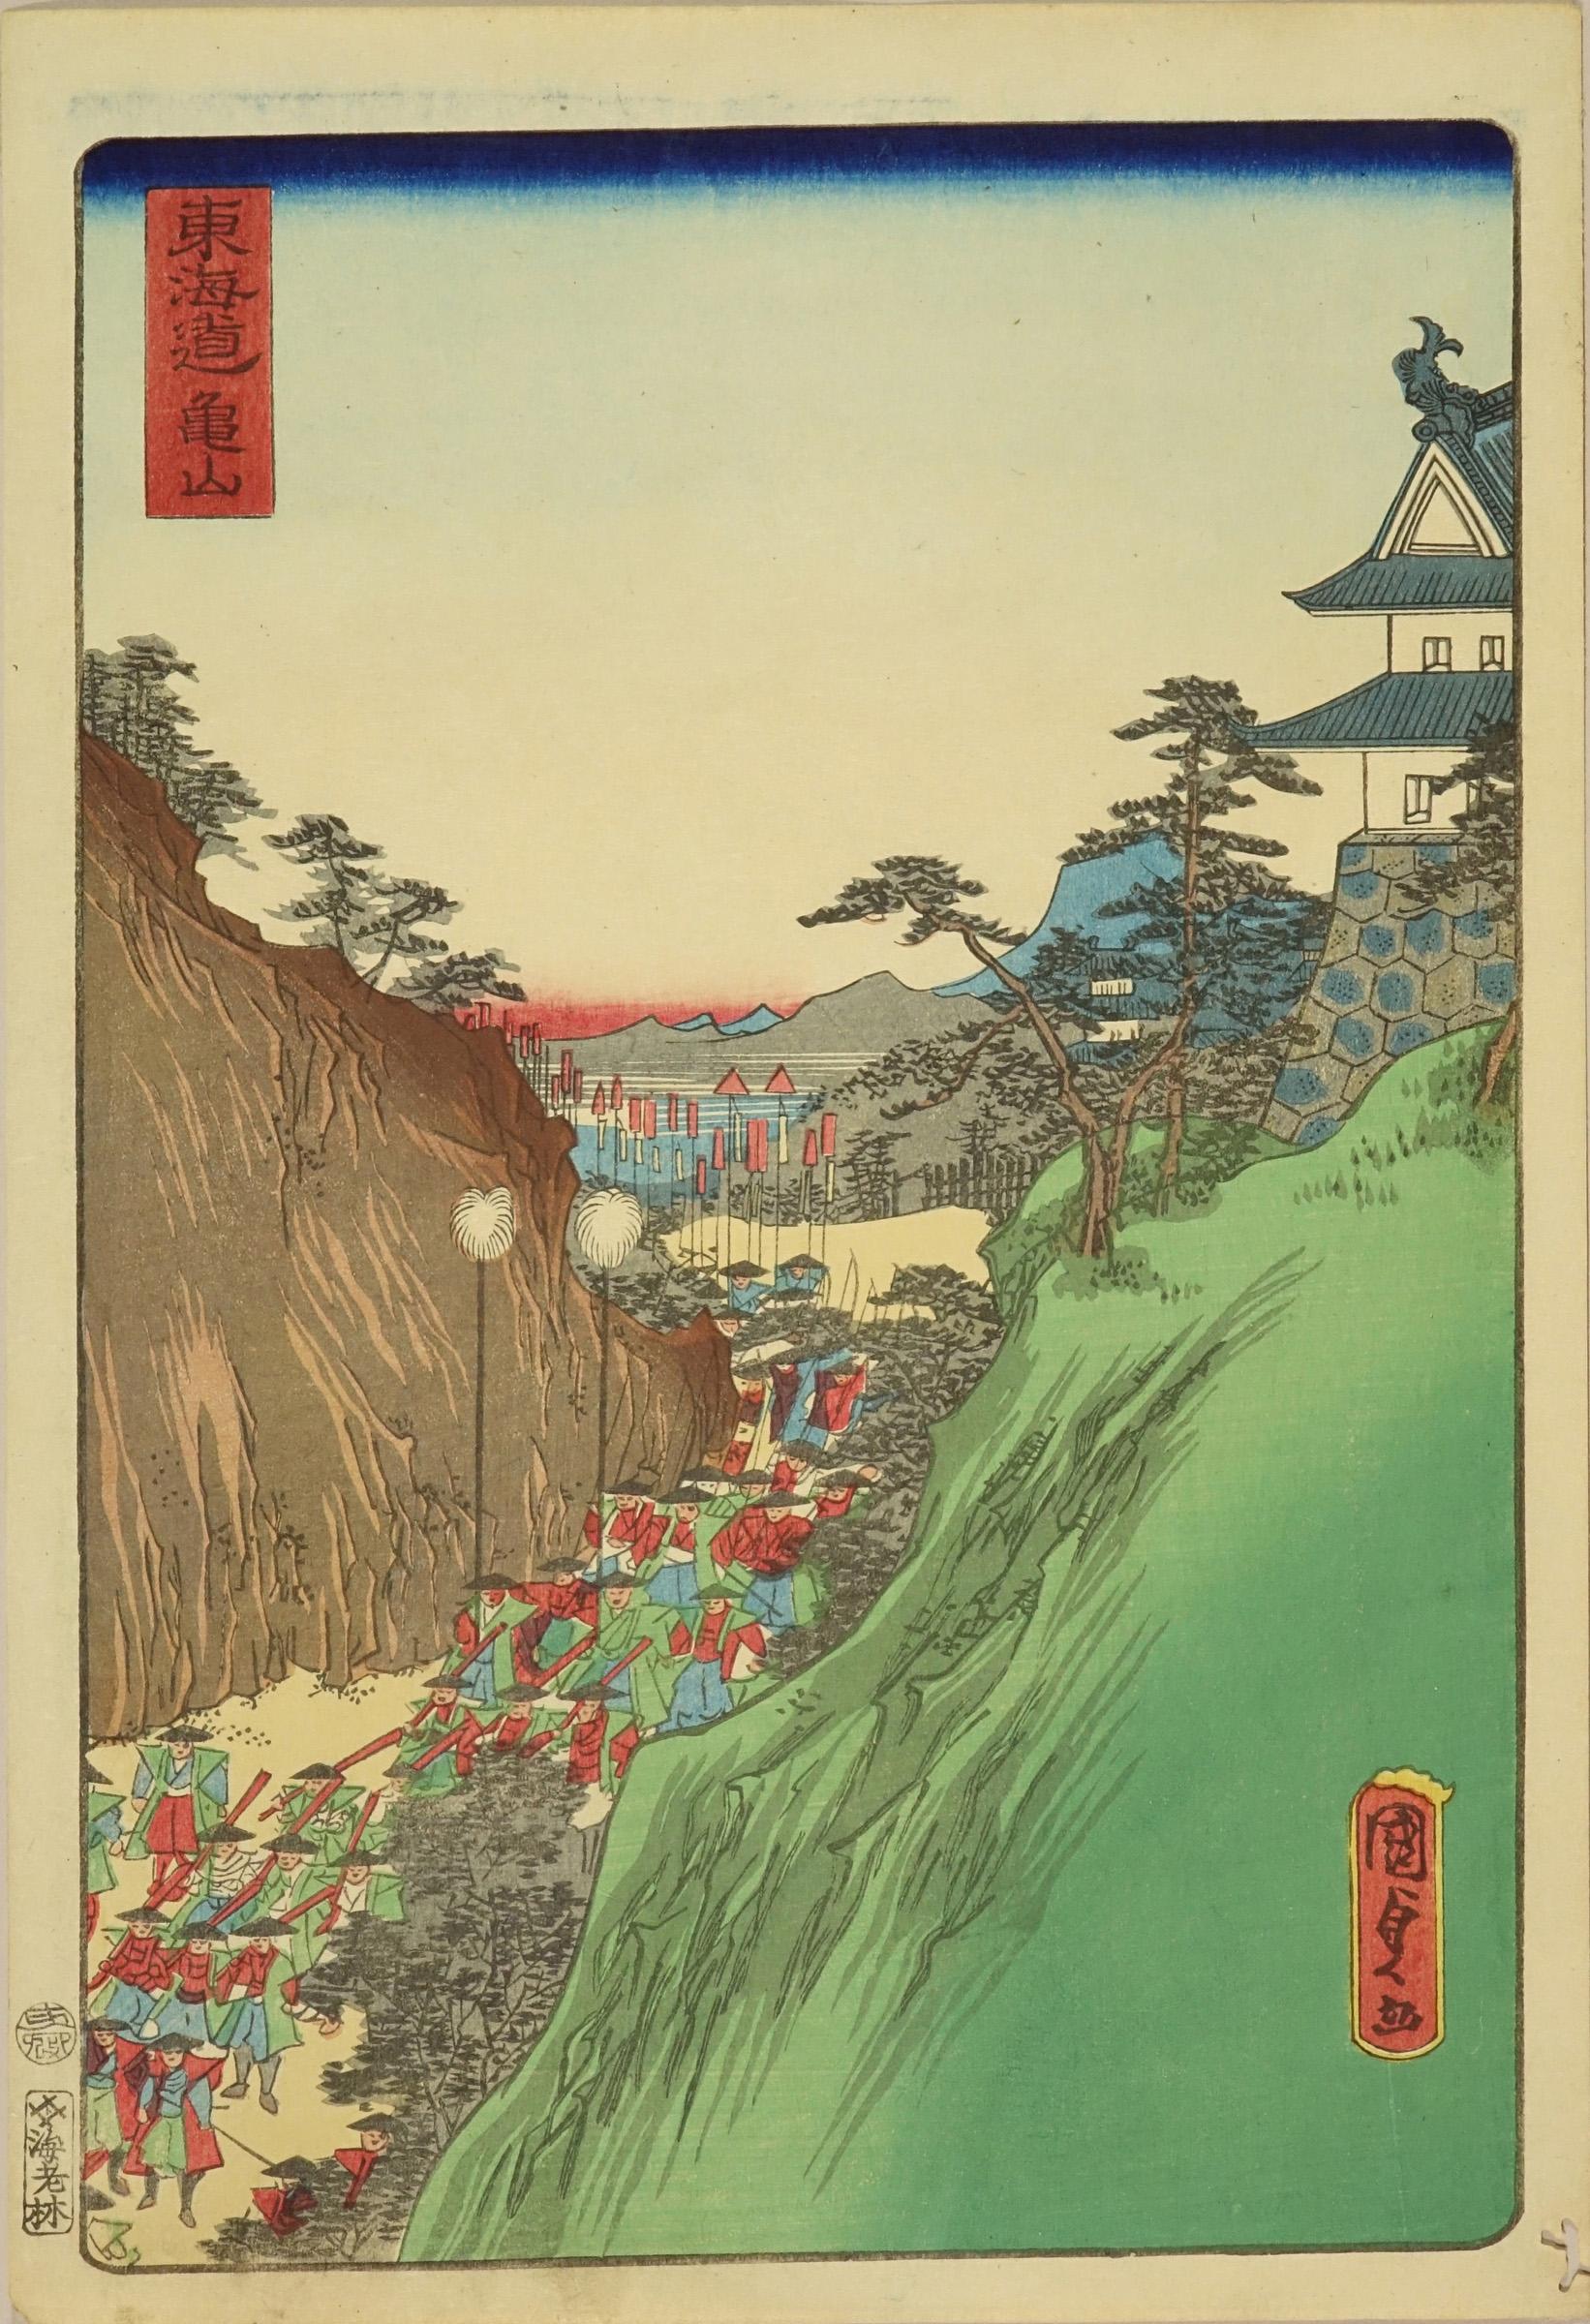 KUNISADA II Kameyama, from <i>Tokaido</i> ([the Fifty-three stations of the] Tokaido) (the 'procession' Tokaido)